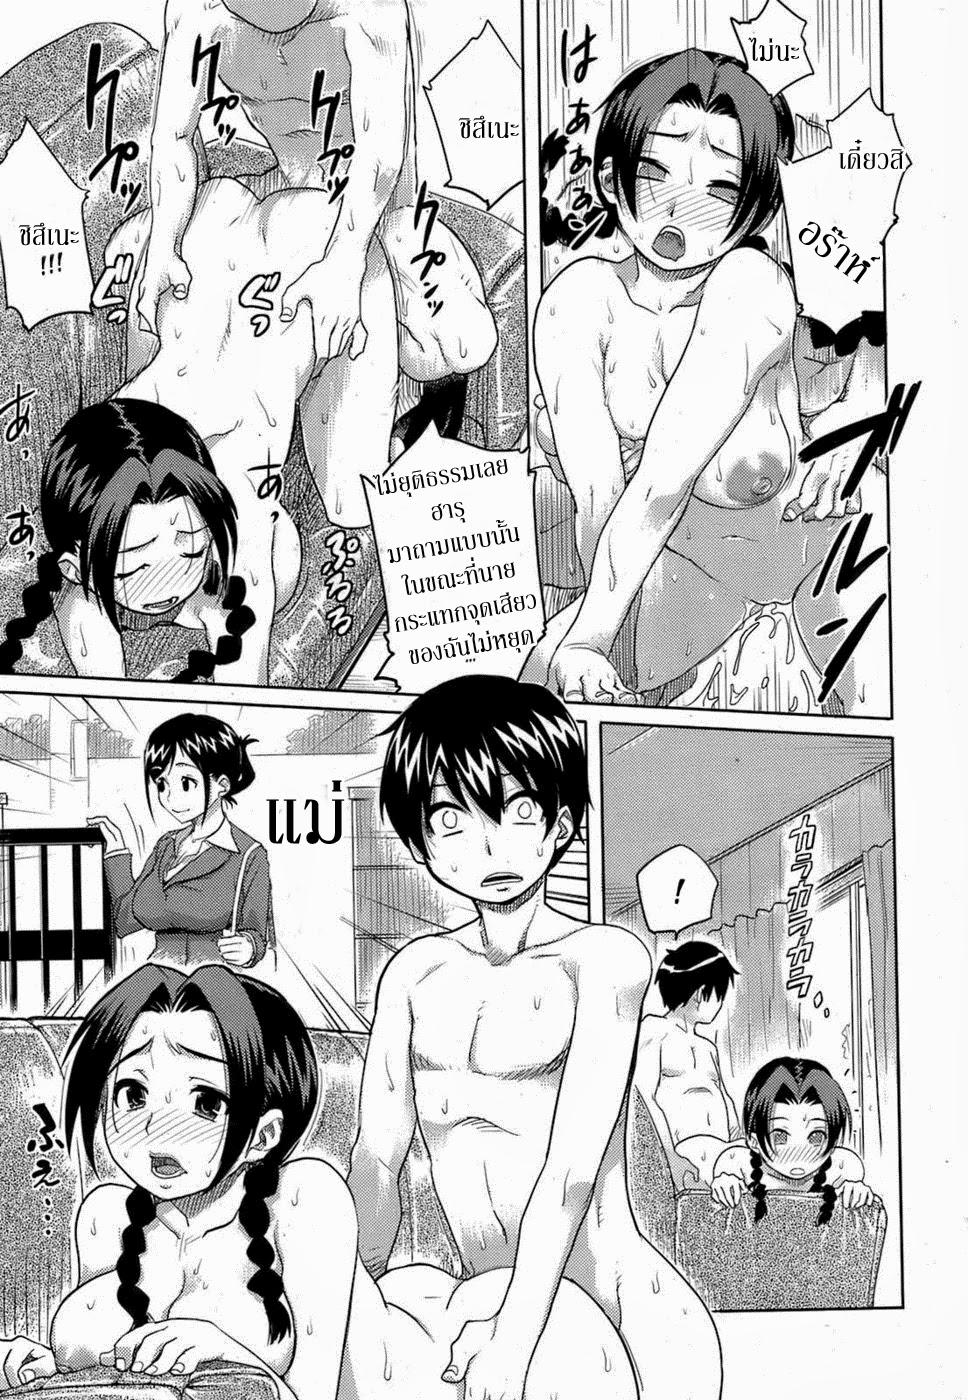 [Isako Rokuroh] Kyoudaizakari น้องชายสุดหื่นกับพี่สาวขี้เล่น (Bishoujo Kakumei KIWAME 2009-04 Vol. 1) [Thai ภาษาไทย] [viewnakaf] [Decensored]